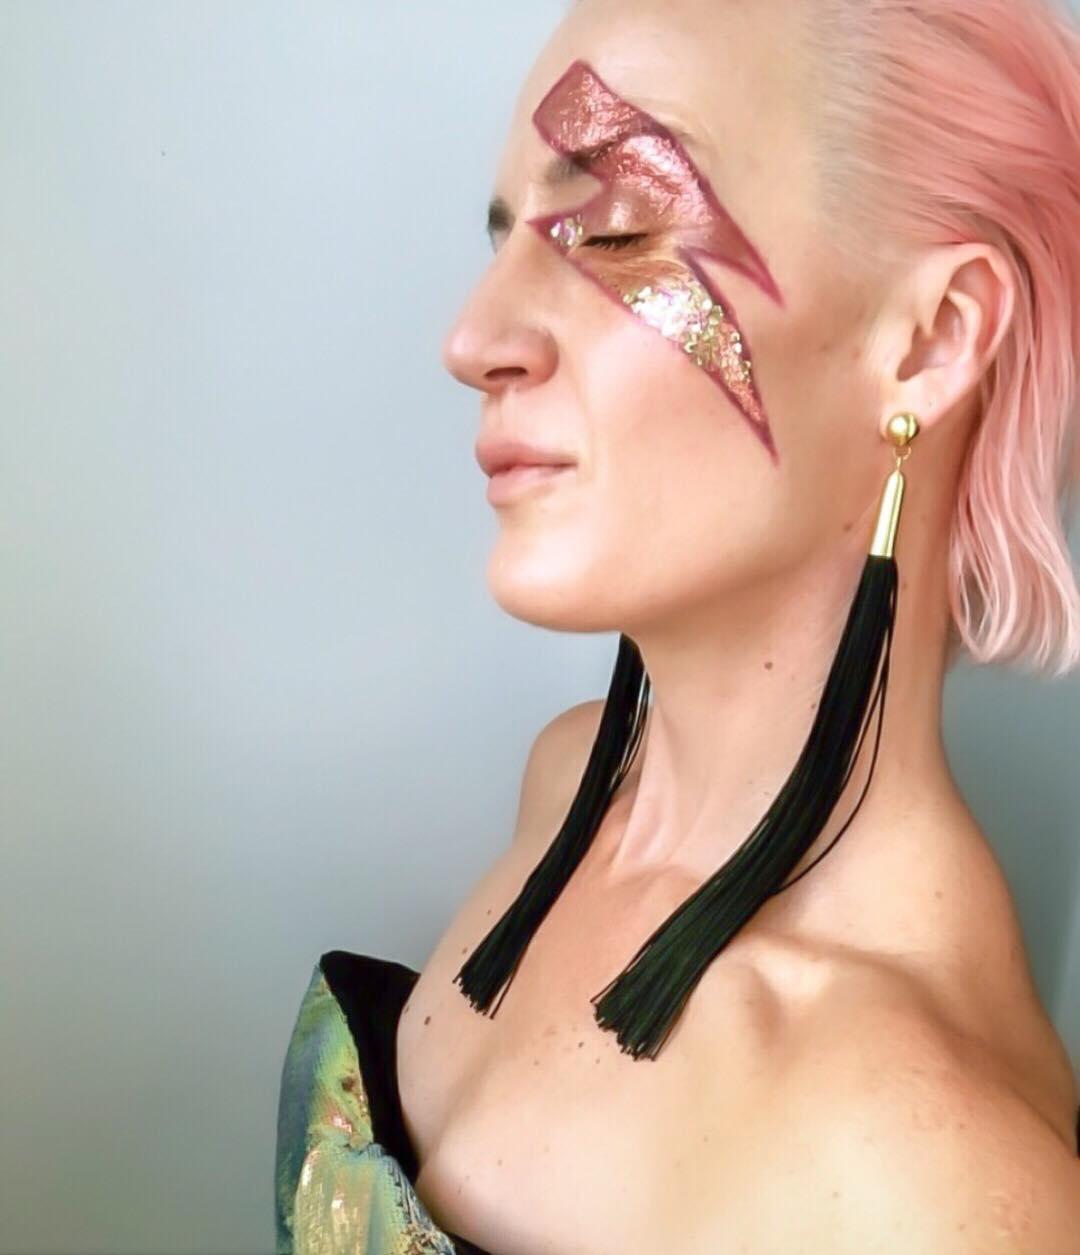 Willis-york-lady-with-pink-hair.jpg